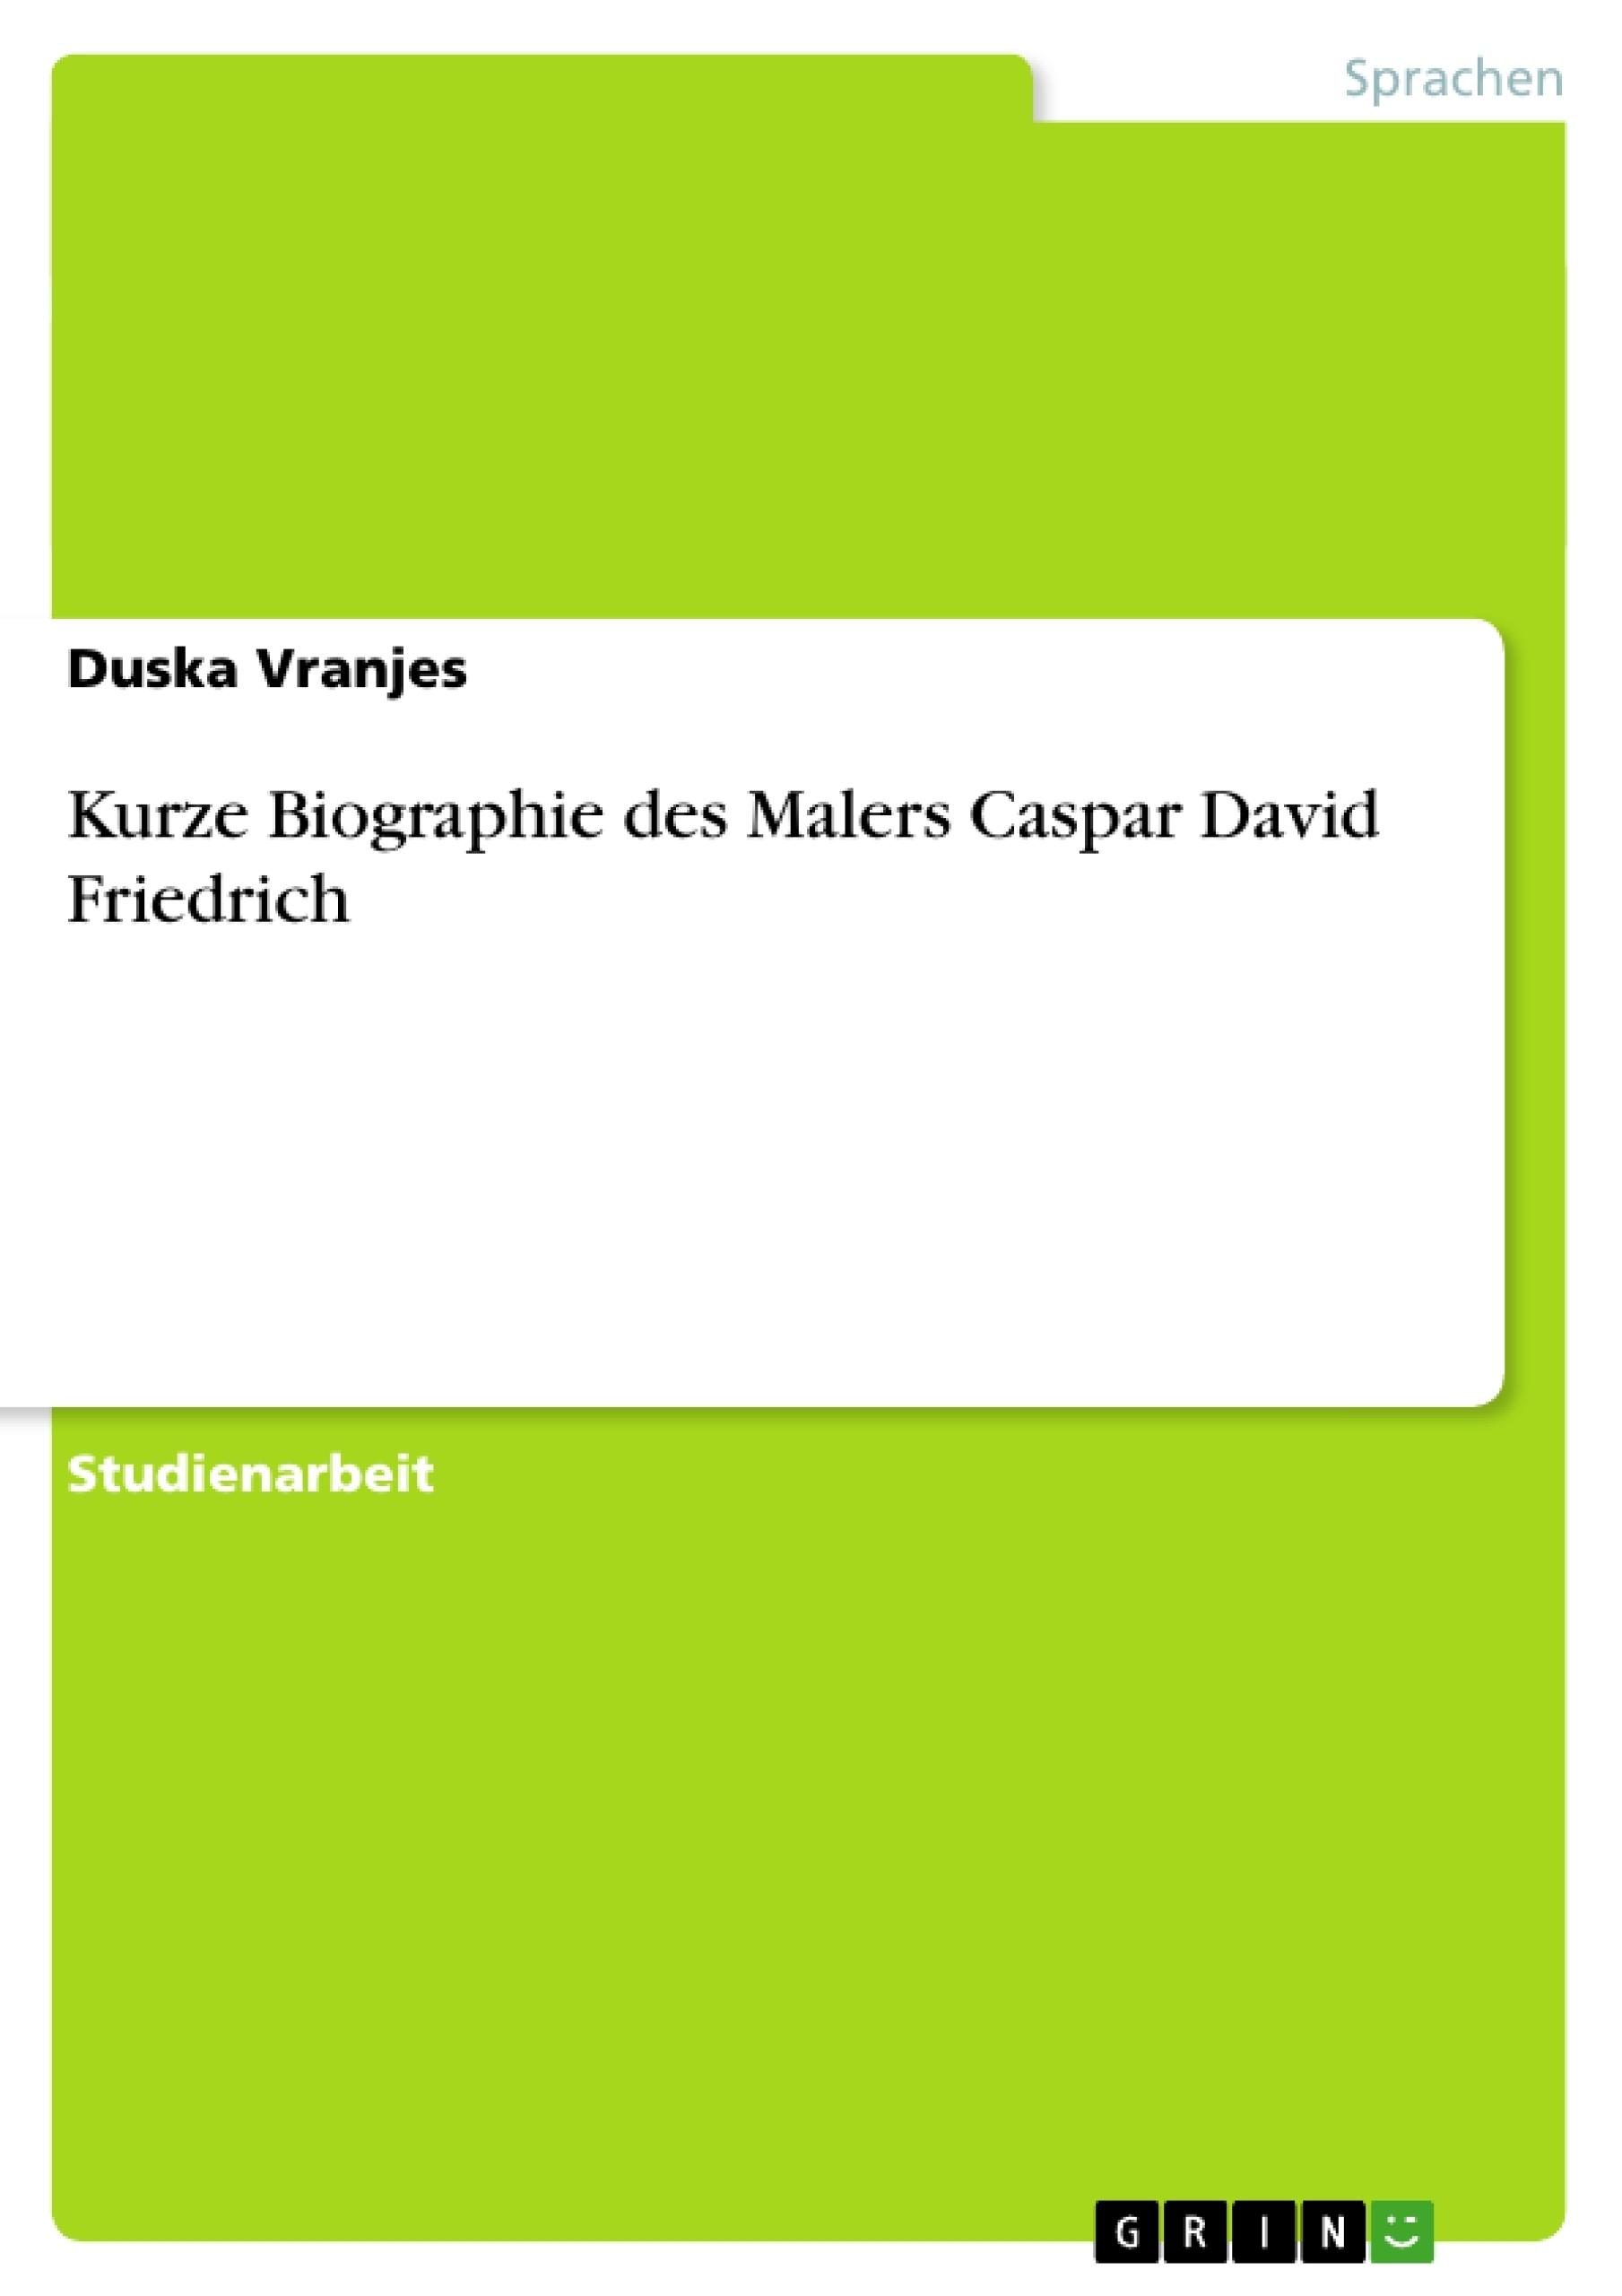 Titel: Kurze Biographie des Malers Caspar David Friedrich